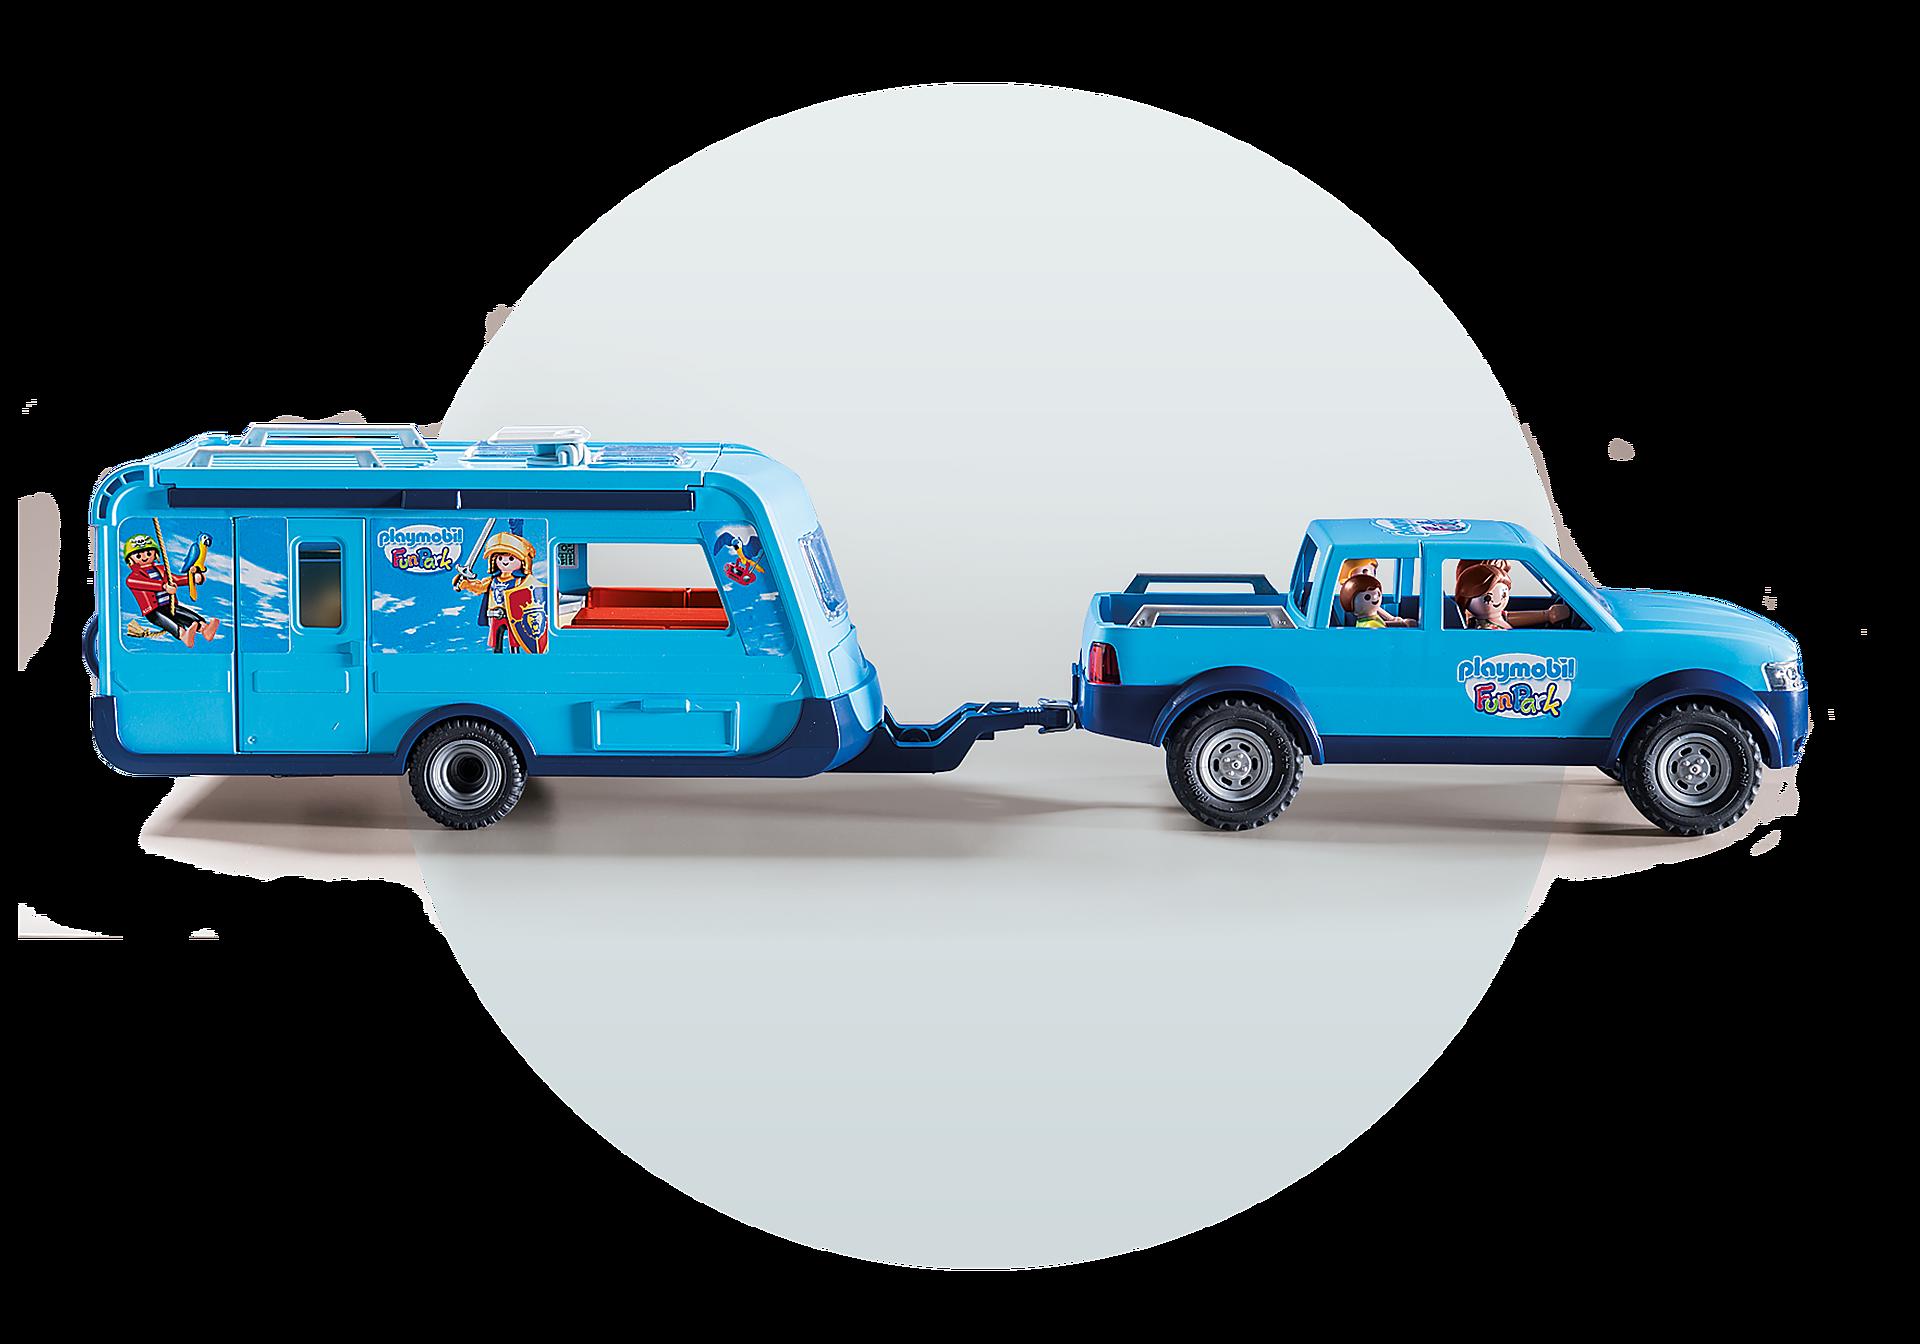 9502 PLAYMOBIL-FunPark Pick-Up mit Wohnwagen zoom image7